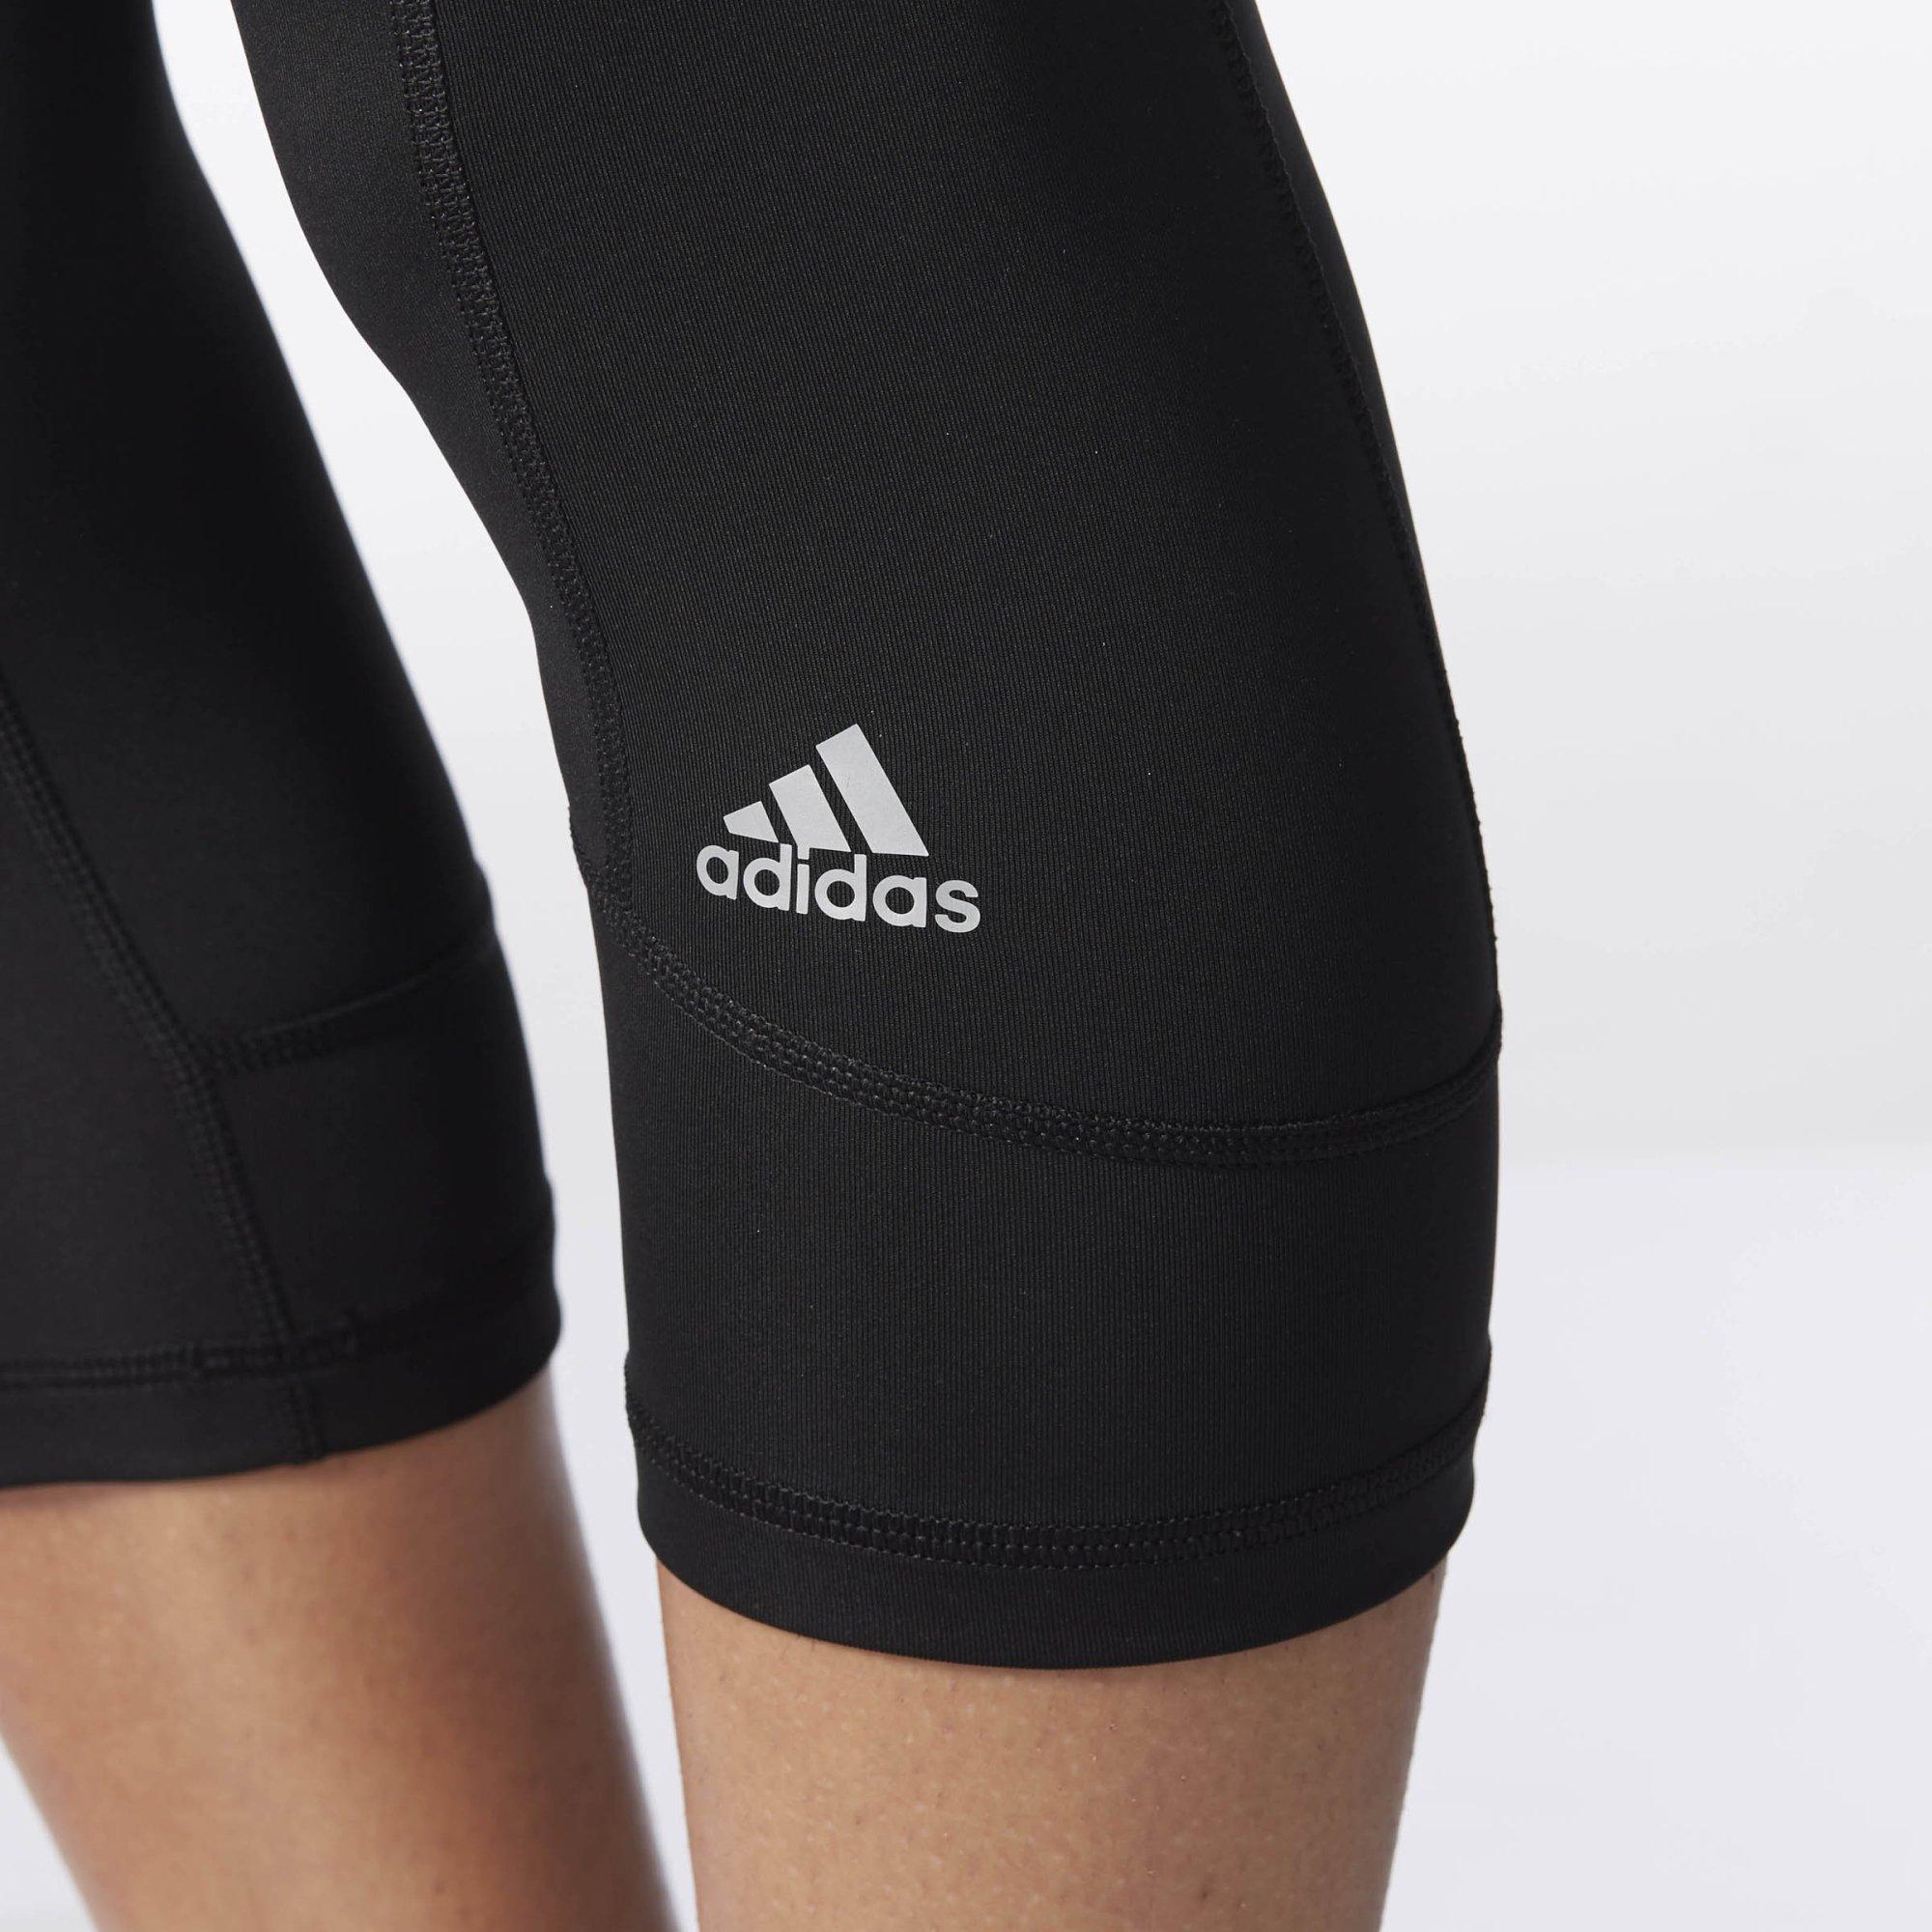 adidas Women's Techfit Capris, Black/Matte Silver, X-Small by adidas (Image #2)